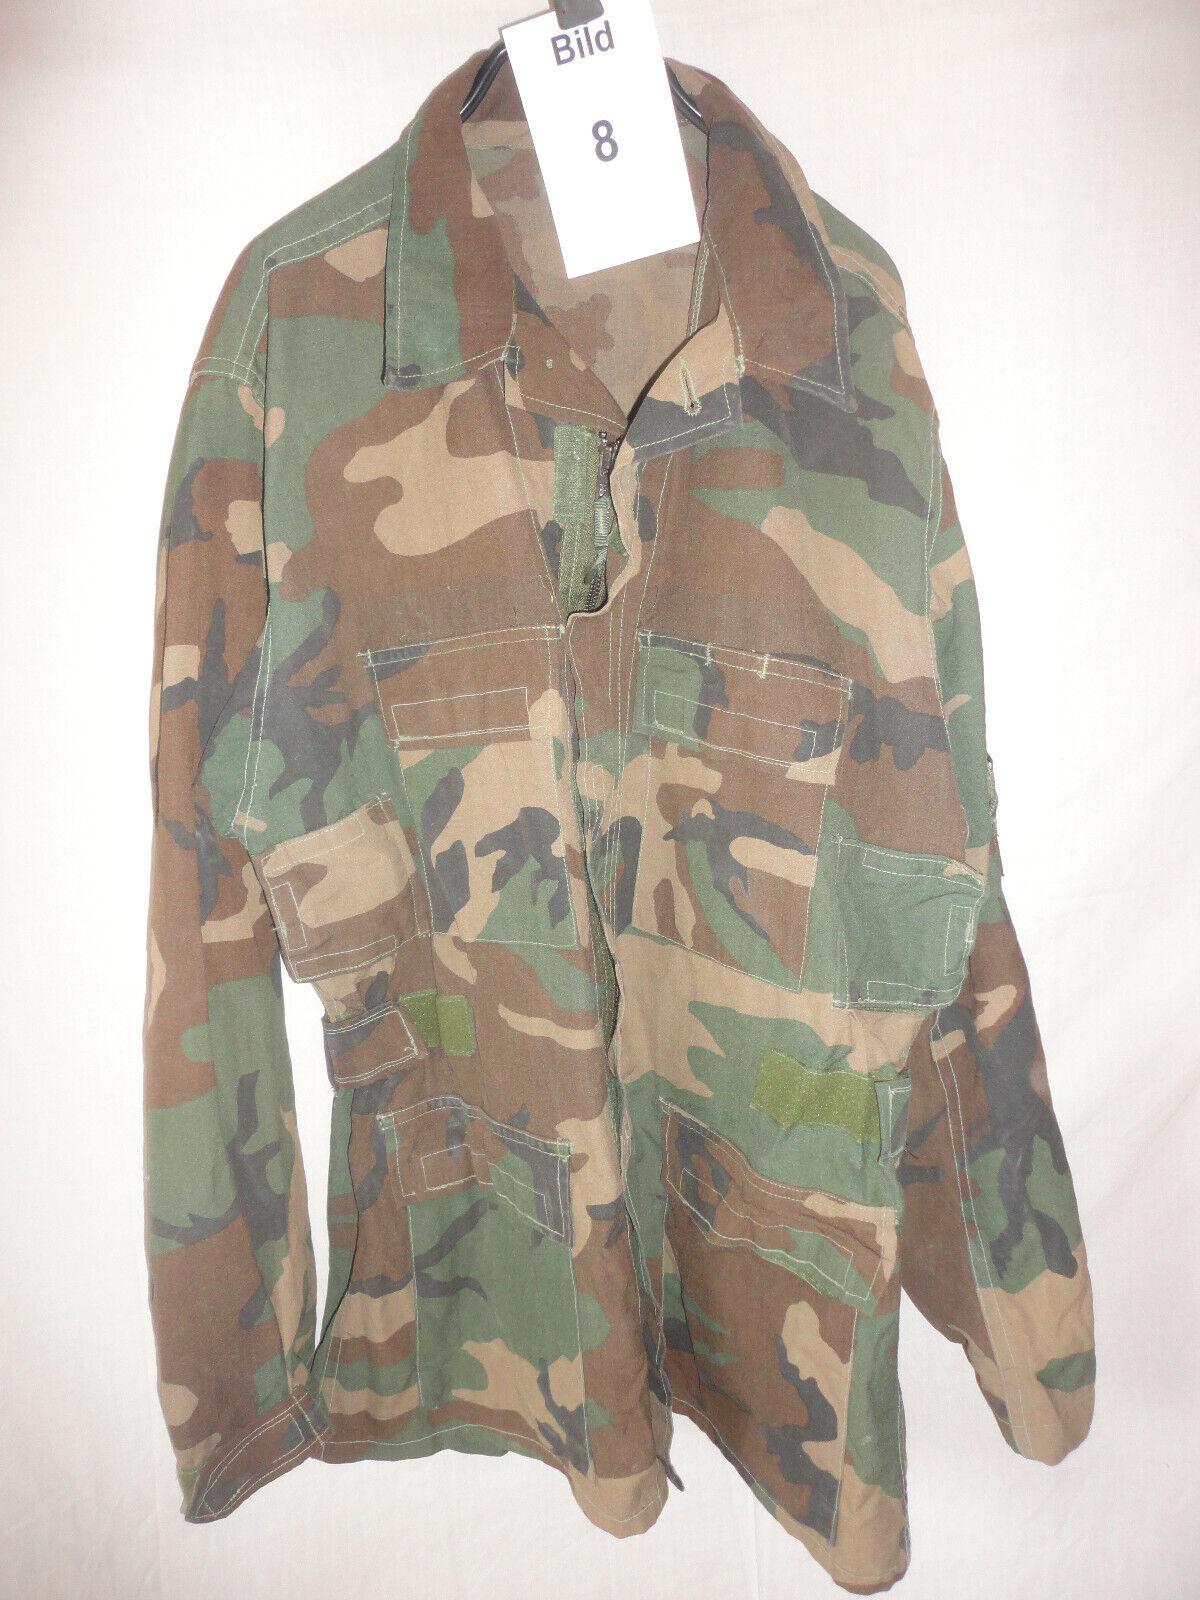 US Coat,Aircrew Bild 8 = M - R